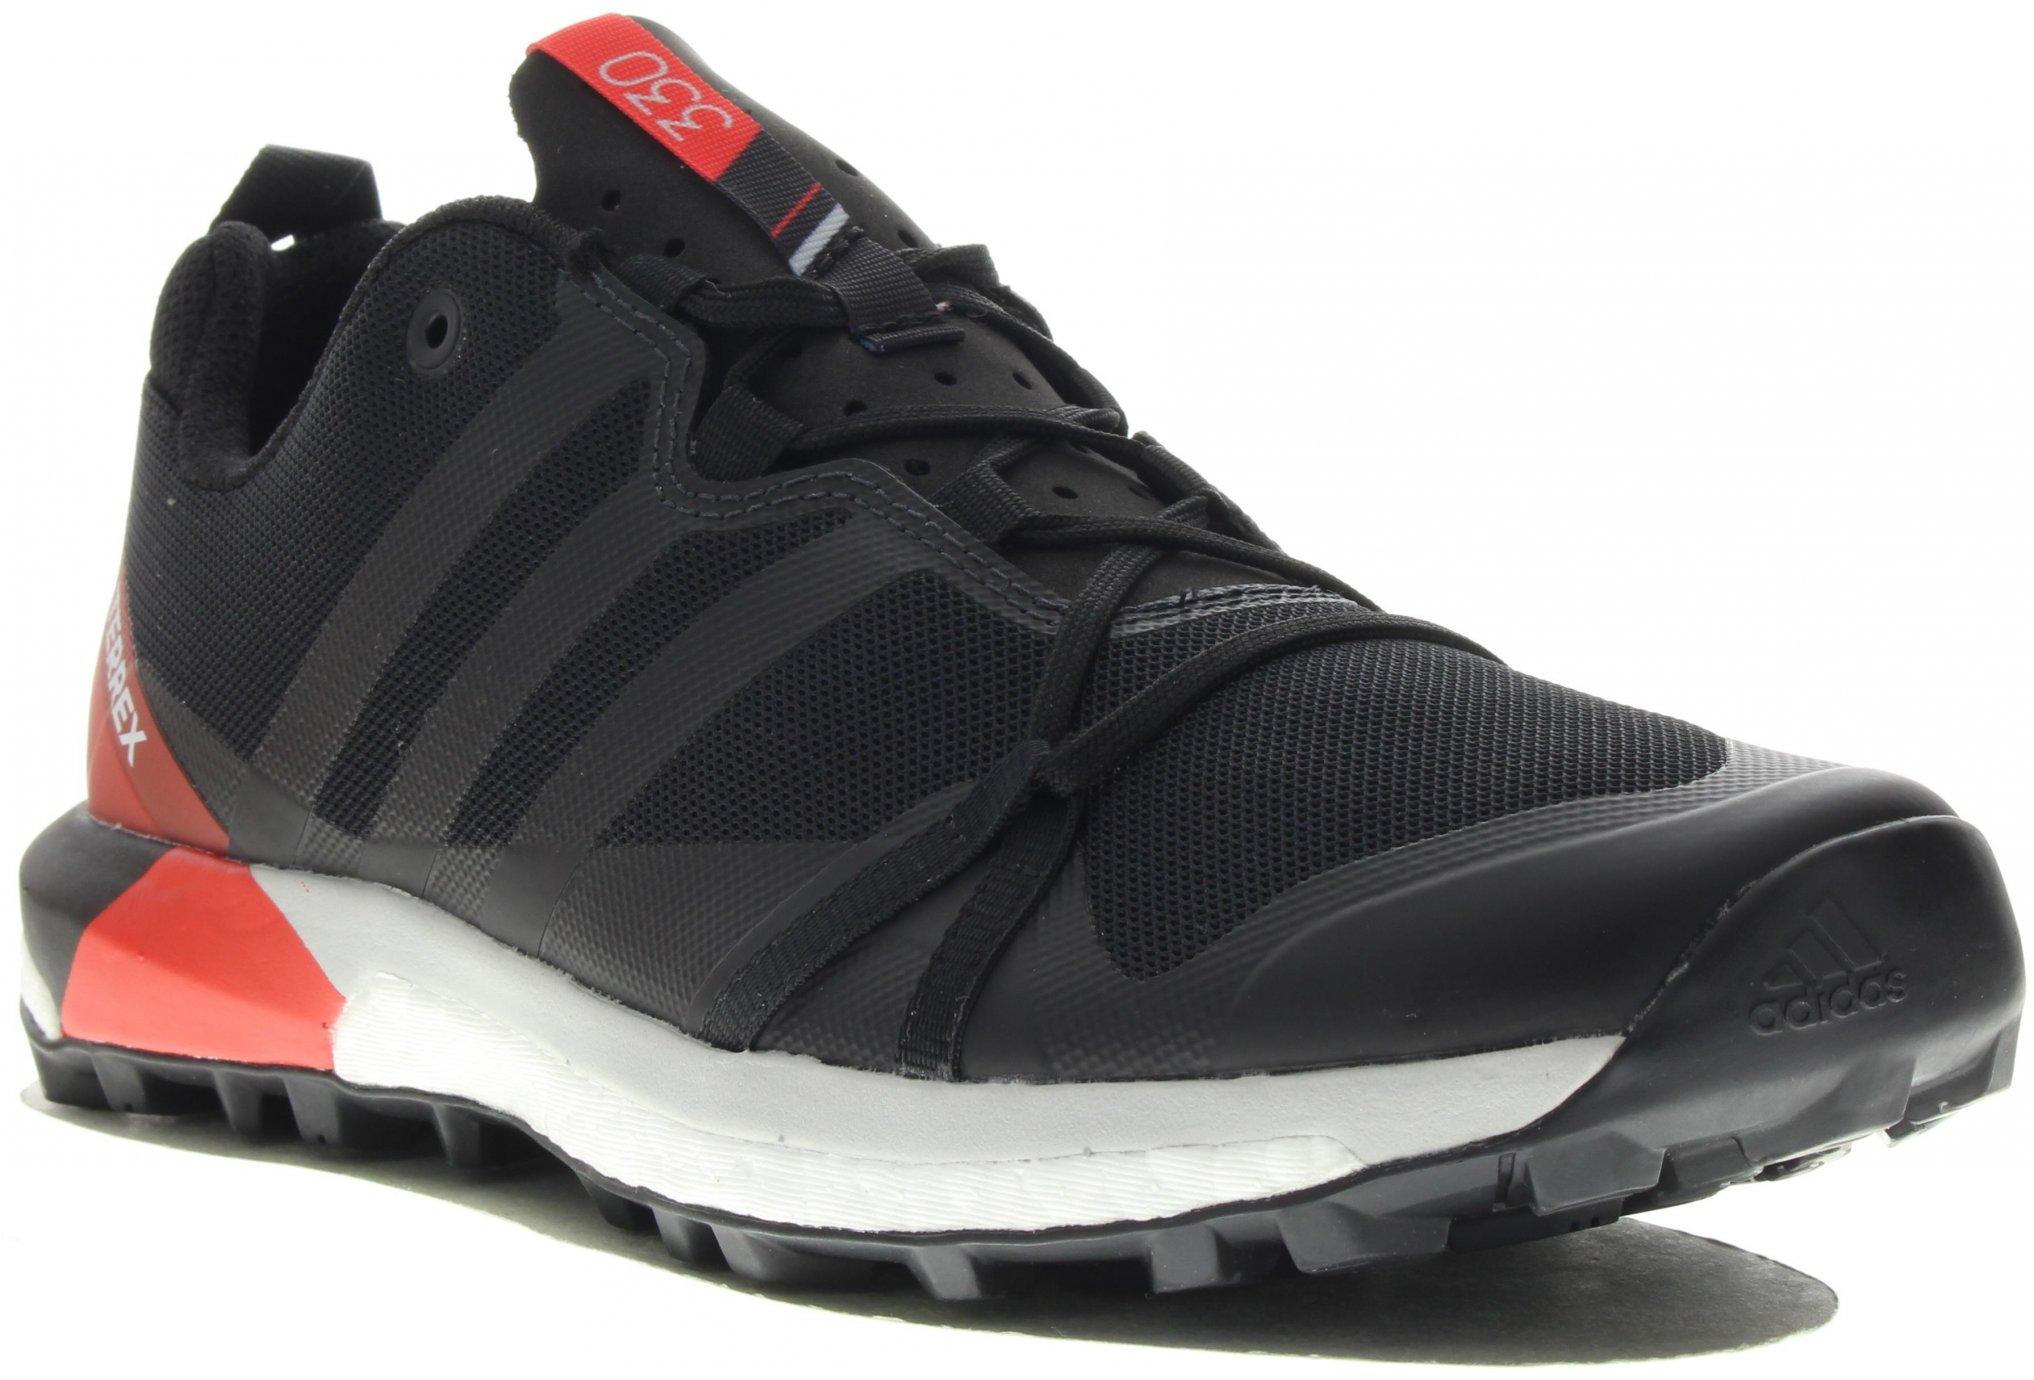 Chaussures Cqv6fz1wcx Adidas Adidas Trail Chaussures Trail hCQrxtsd